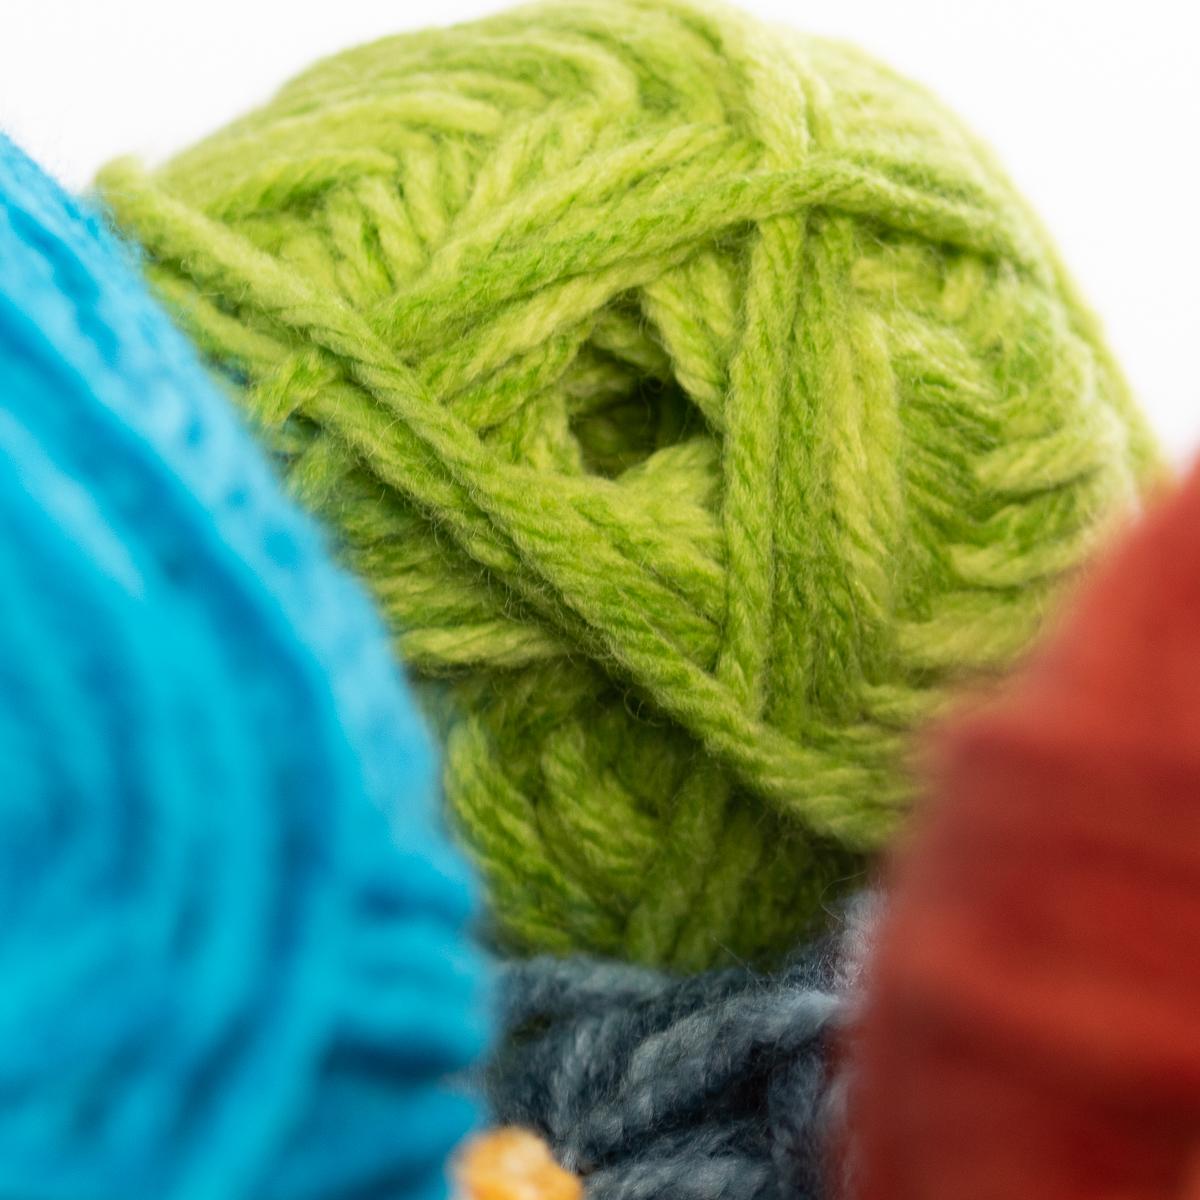 3pk-Lion-Brand-Yarn-Acrylic-amp-Wool-Chunky-Yarn-Bulky-5-Soft-Knitting-Crocheting thumbnail 15